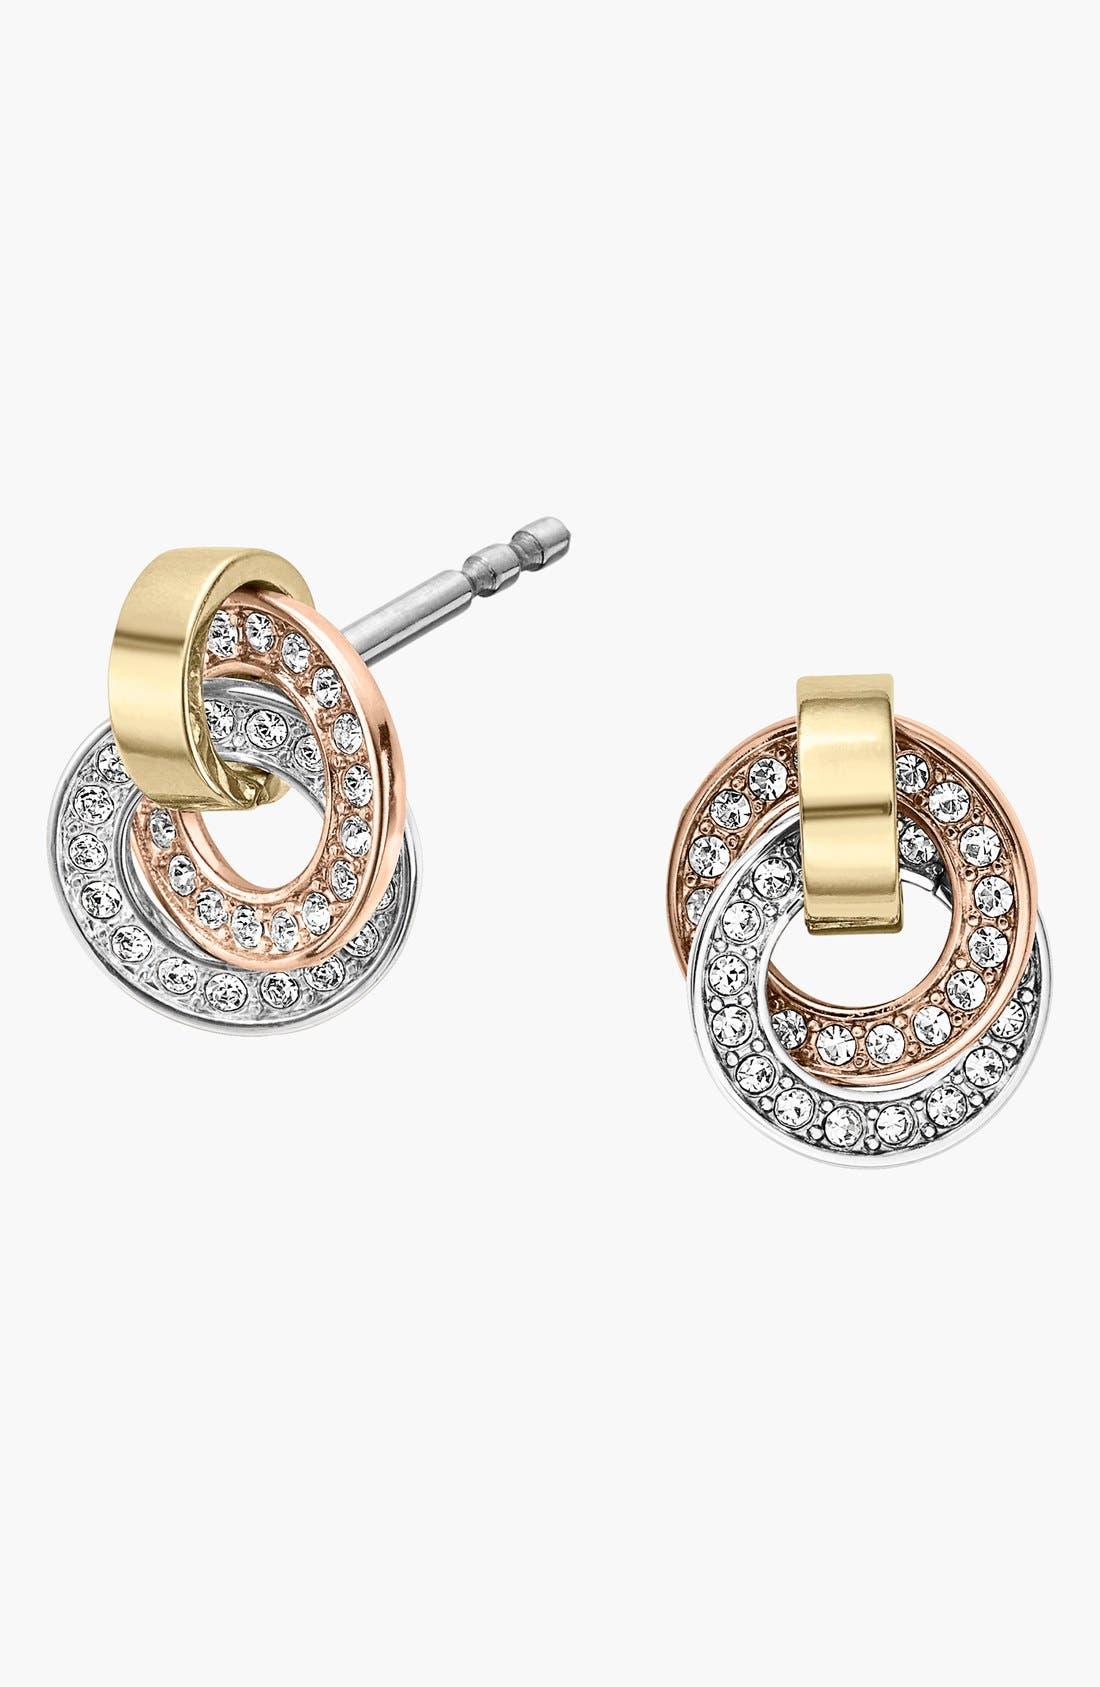 Alternate Image 1 Selected - Michael Kors 'Statement Brilliance' Pavé Stud Earrings